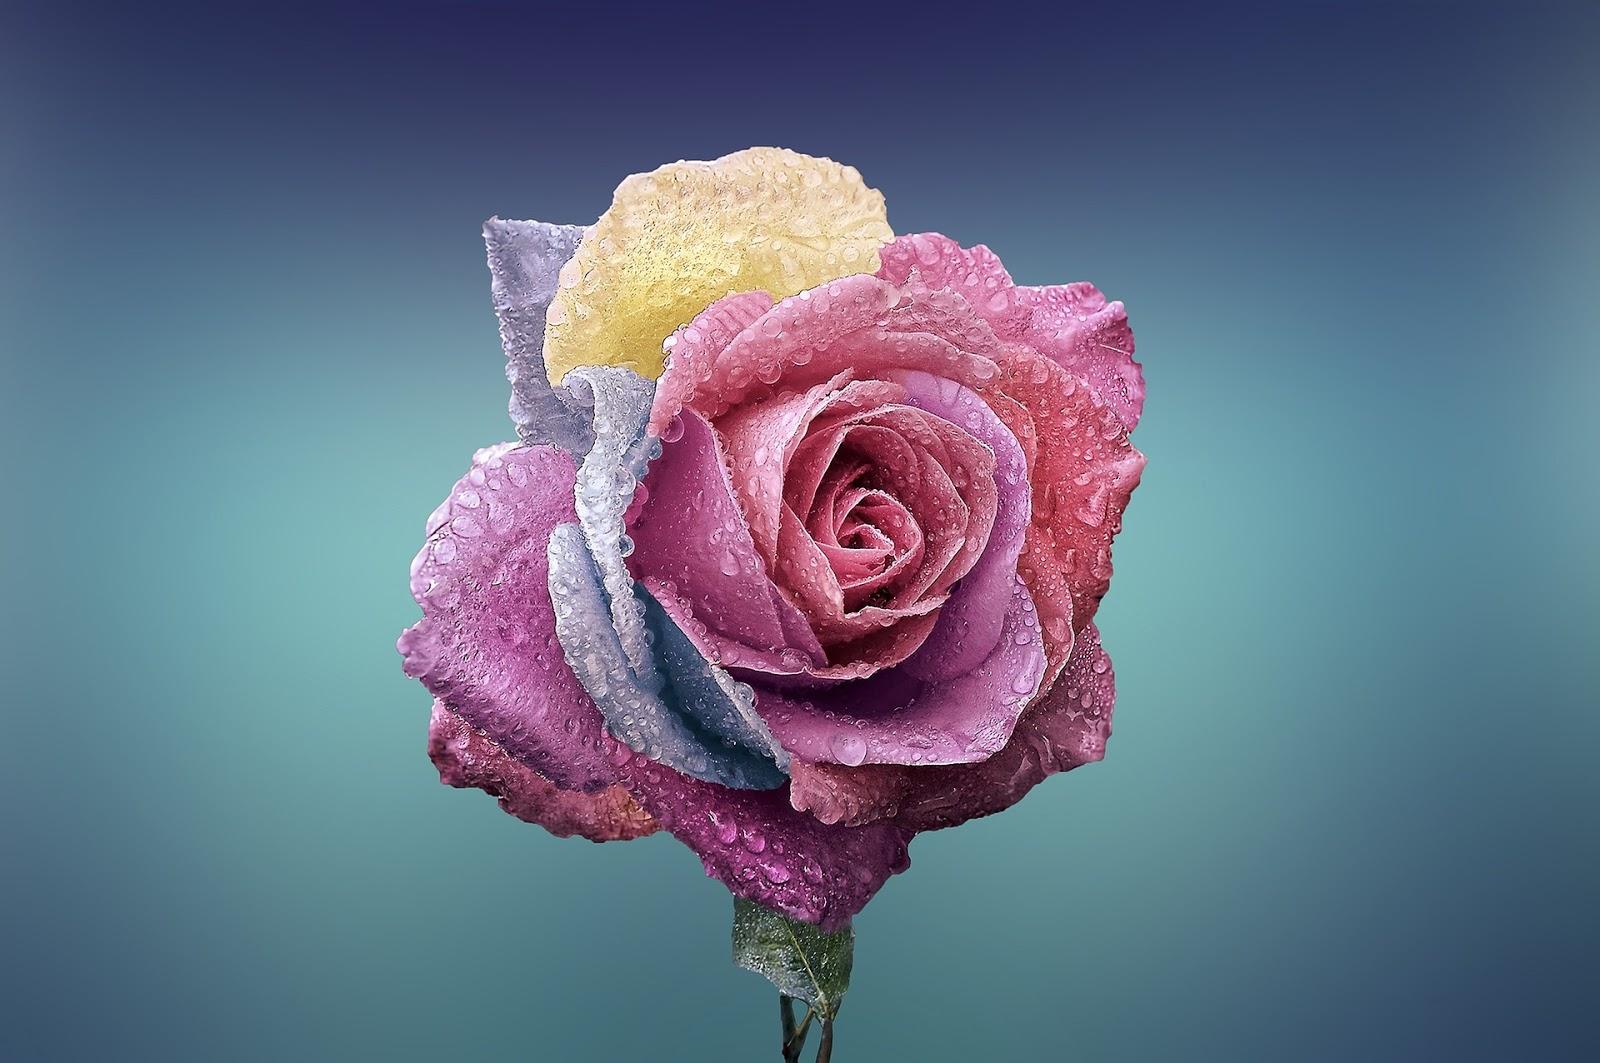 bunga mawar terindah